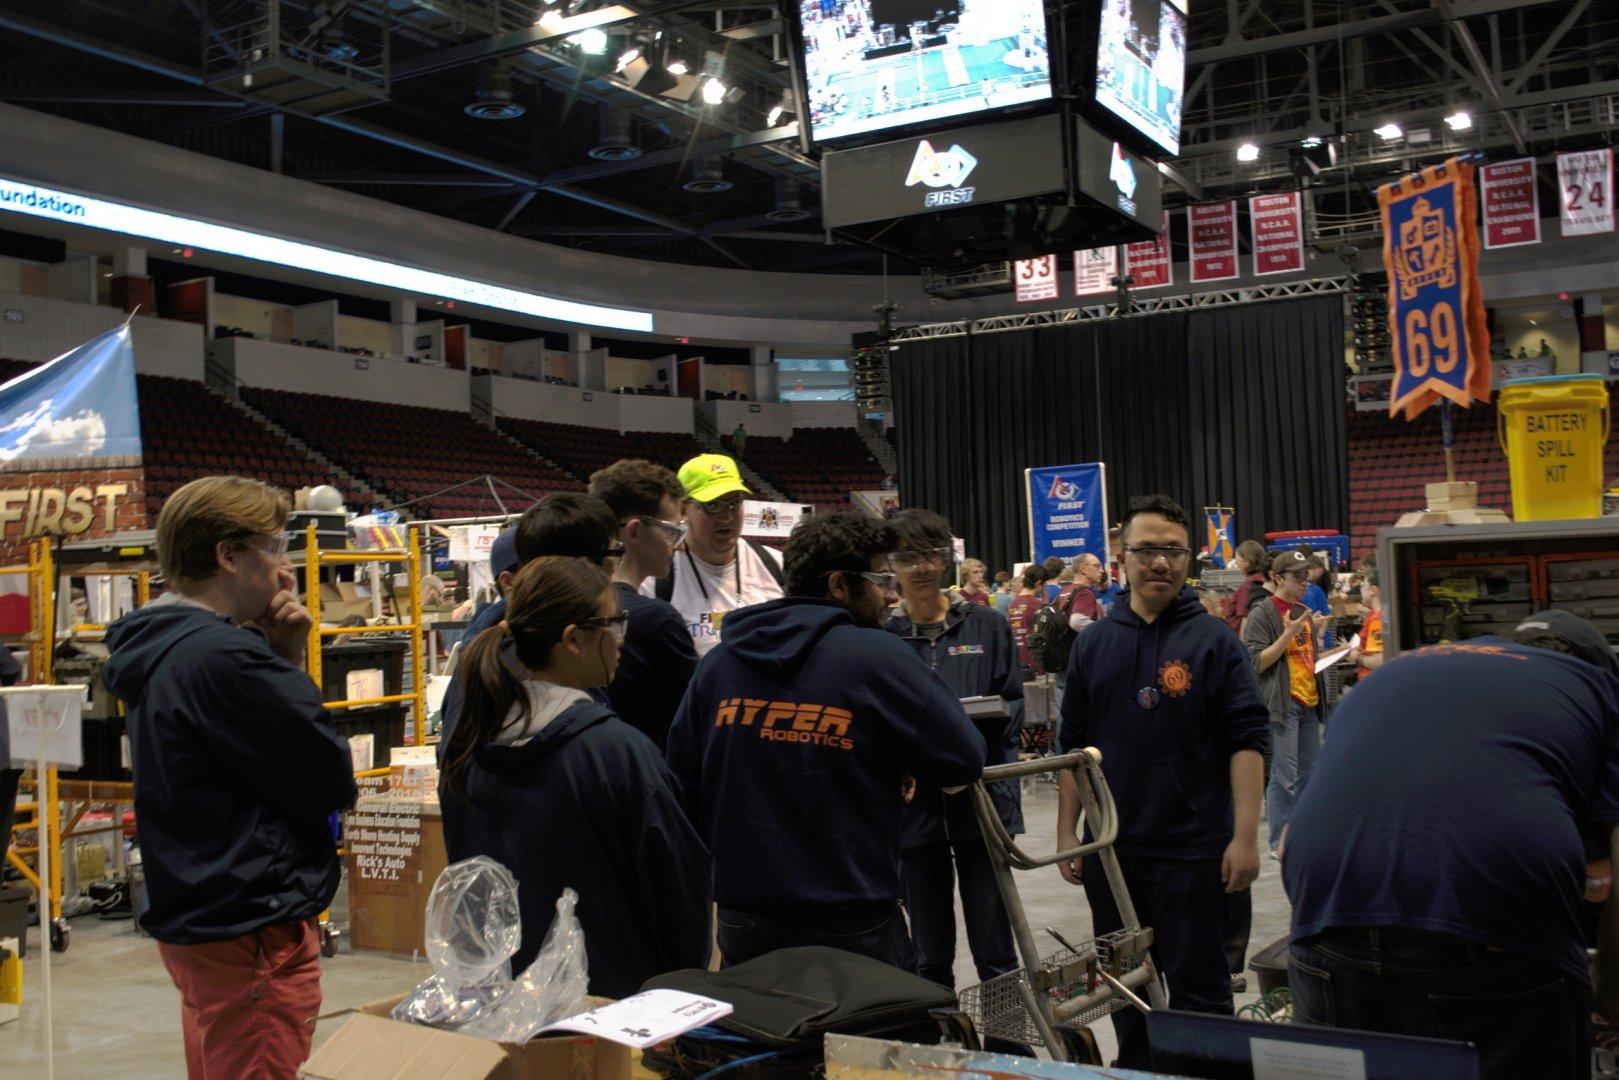 013.Boston FIRST Robotics Competition 04-03-2016.jpg